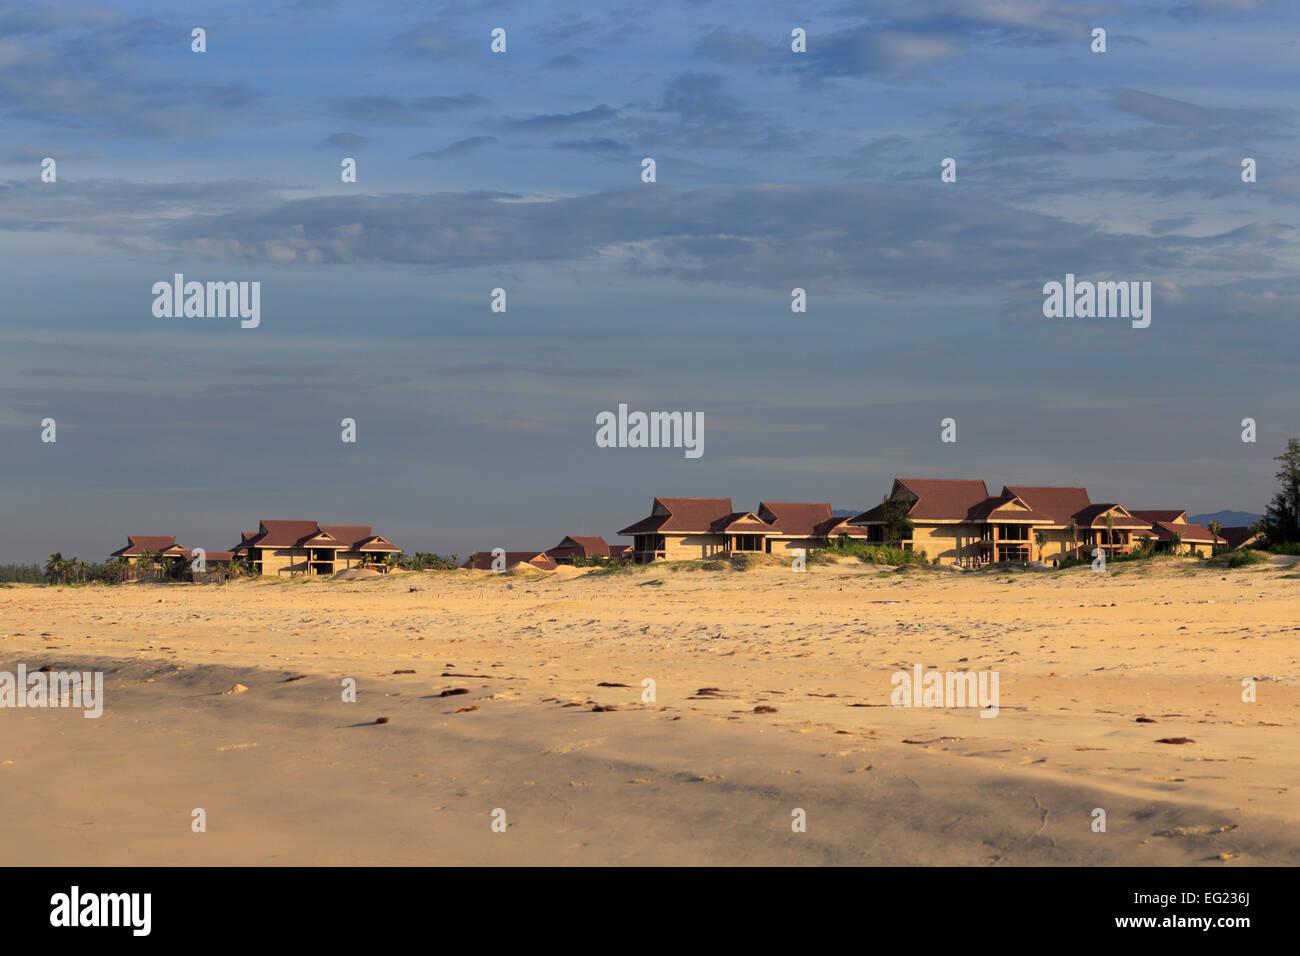 Houses on South China Sea beach near Tam Ky, Vietnam - Stock Image